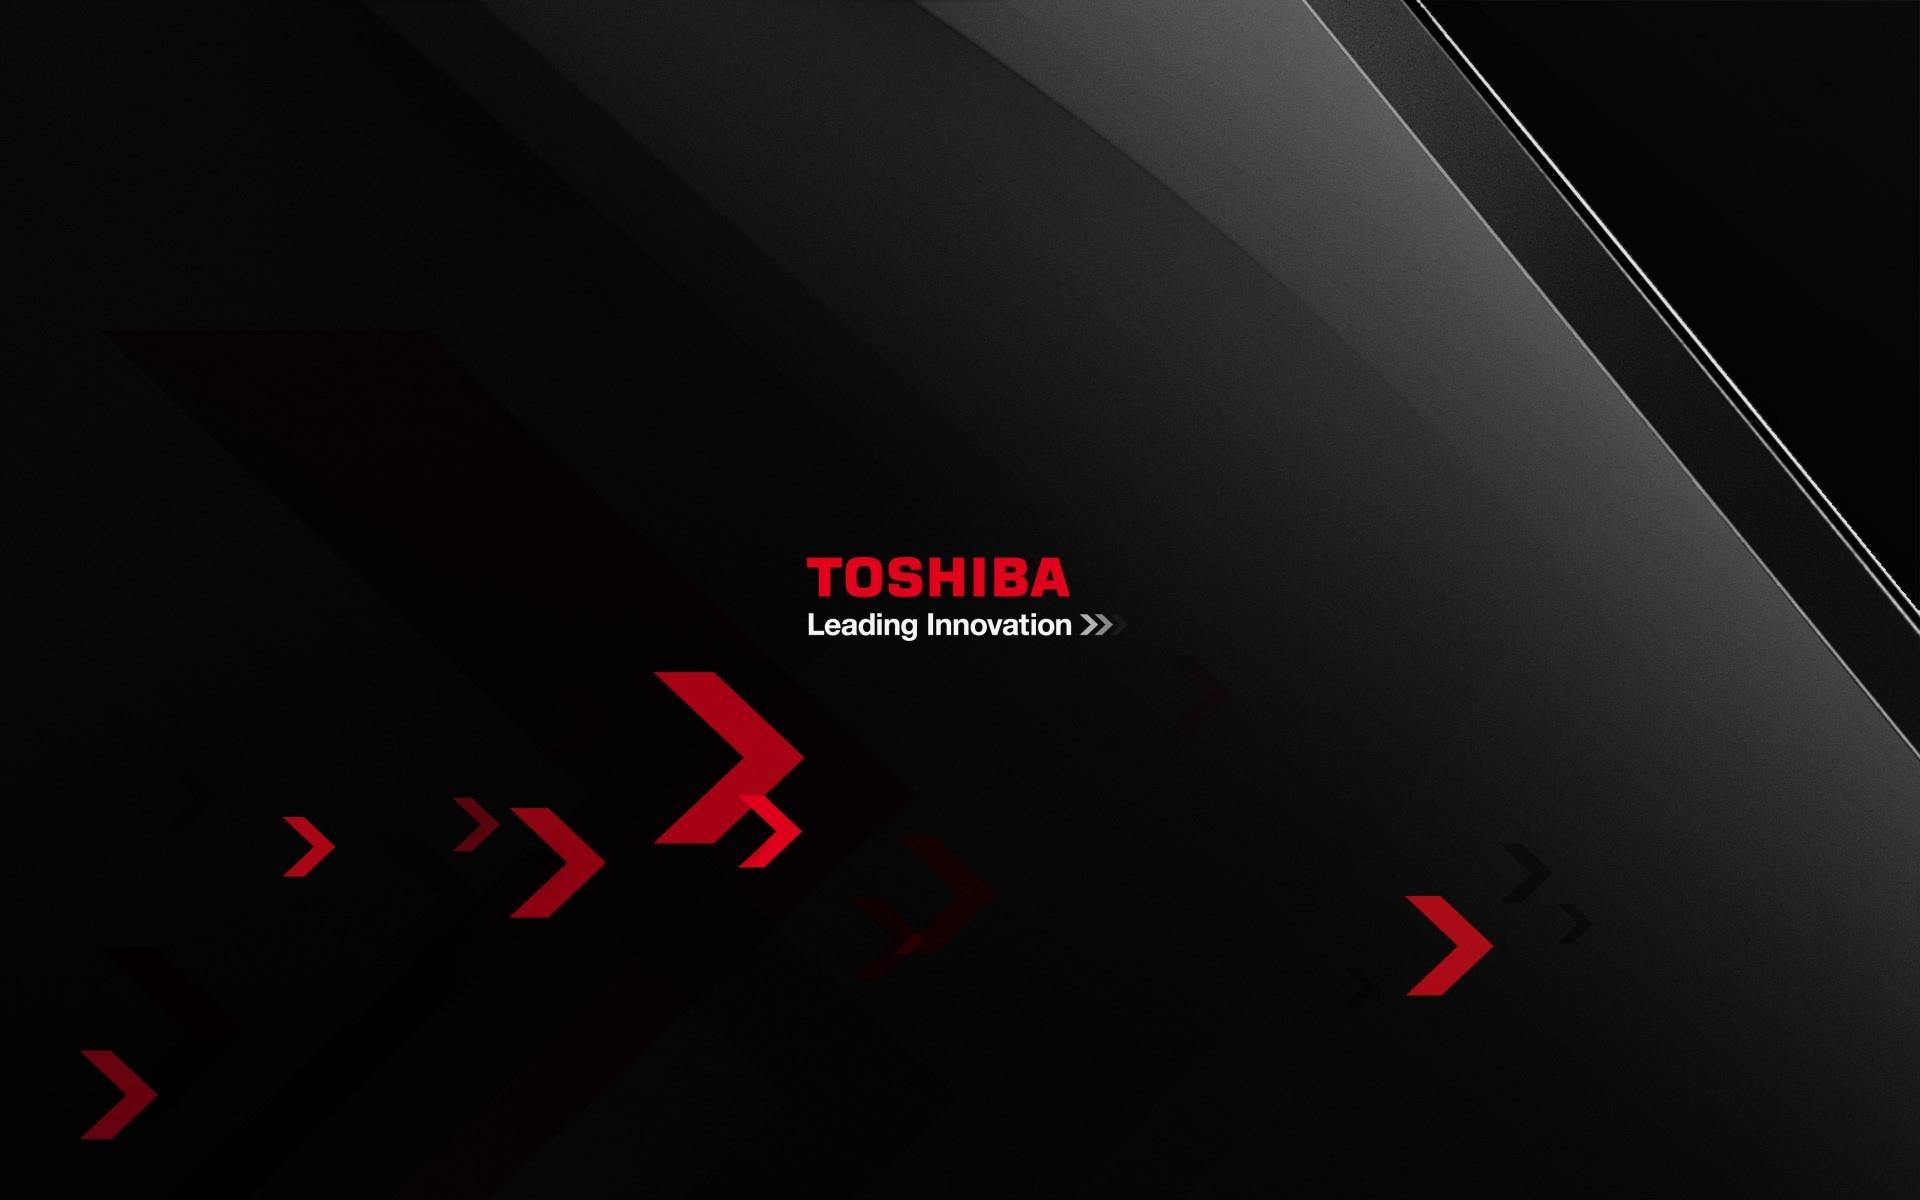 toshiba wallpaper windows 81 (60+ images)